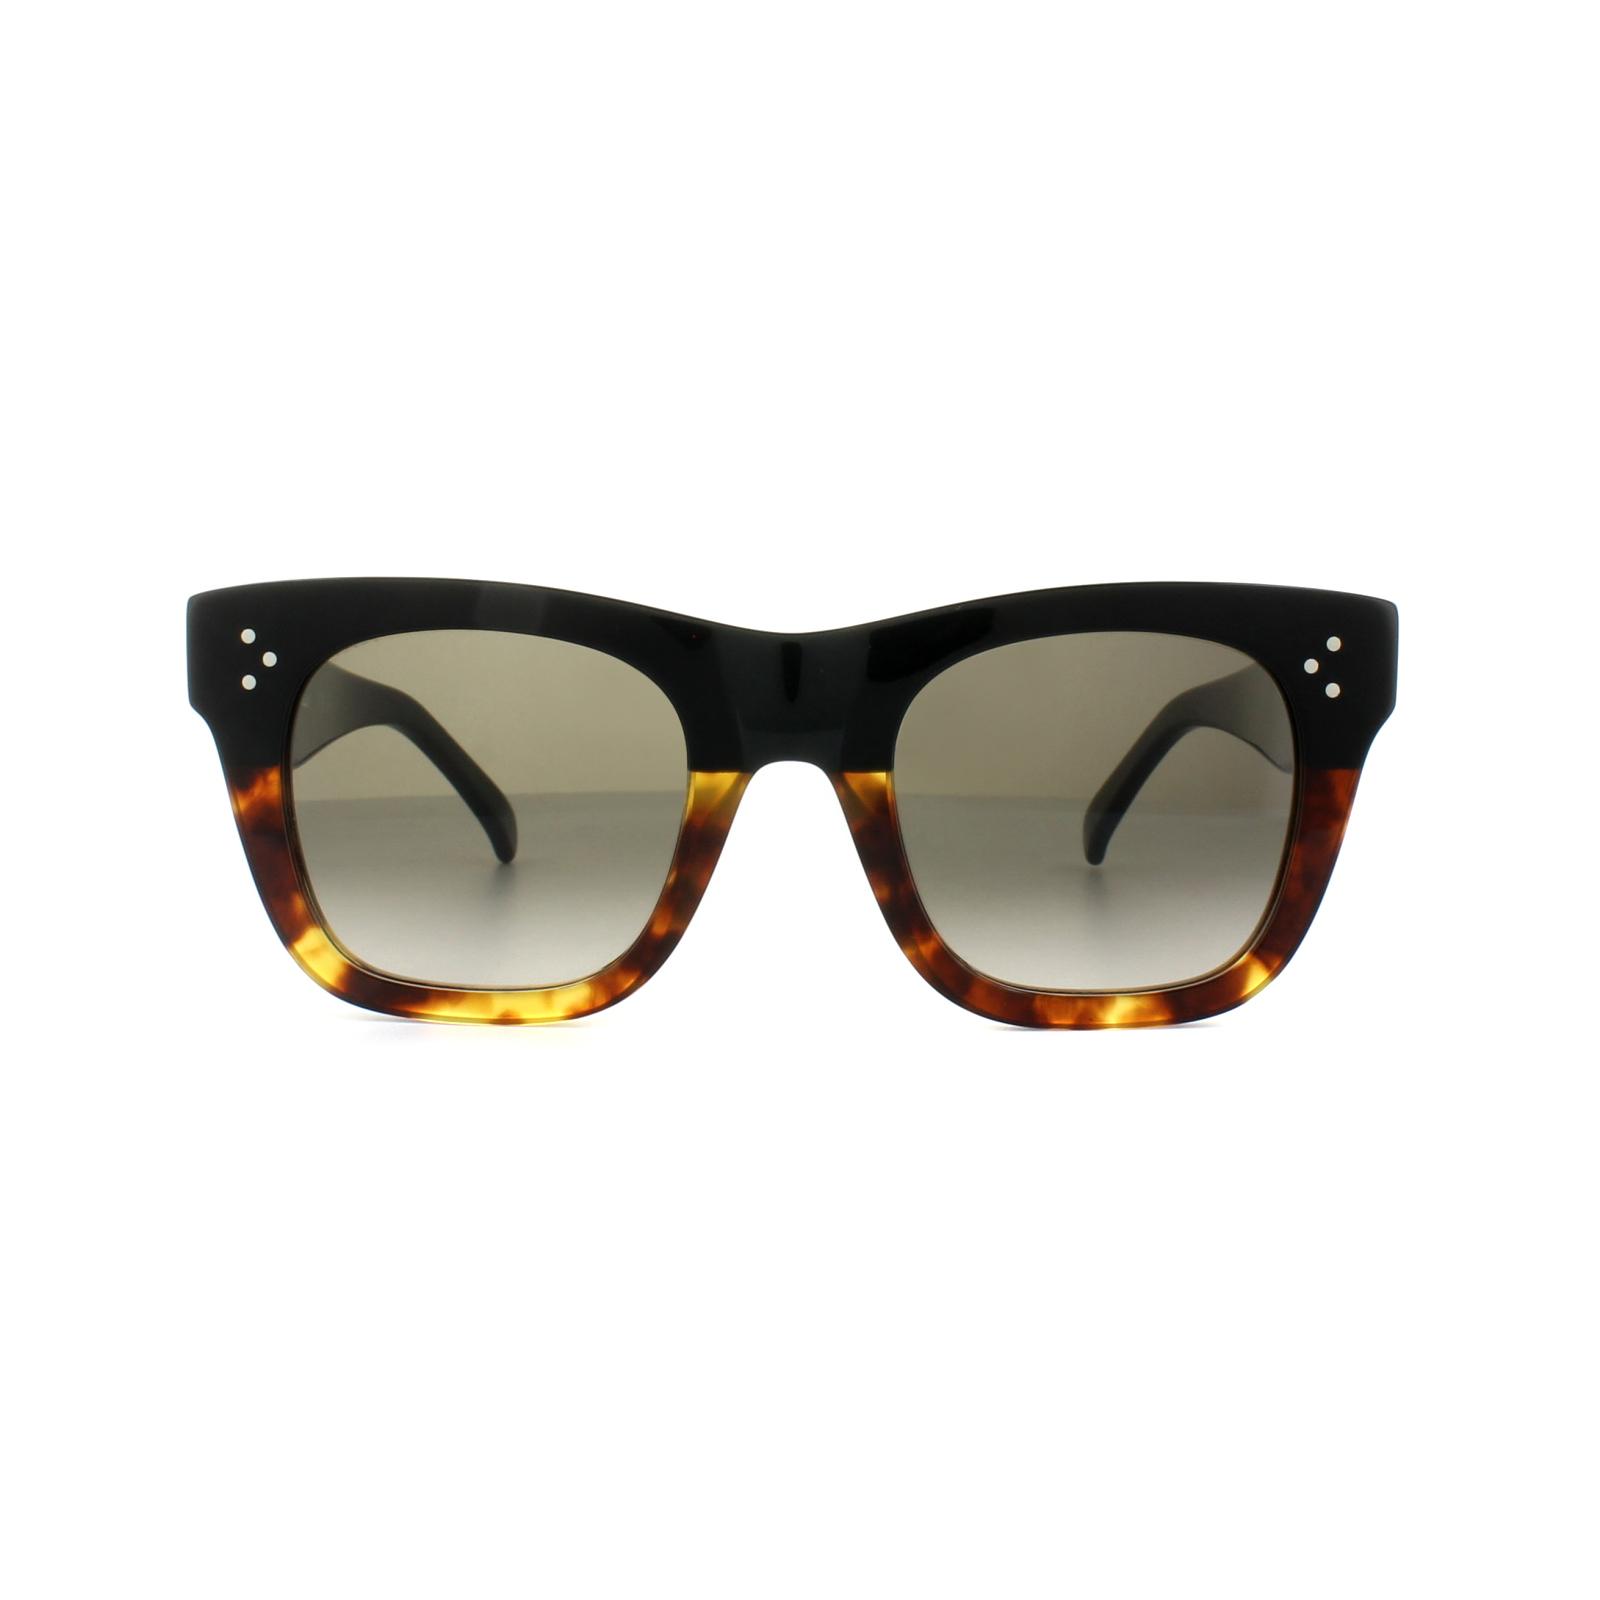 0d6883ad4b6 Cheap Celine 41089 S Catherine Small Sunglasses - Discounted Sunglasses